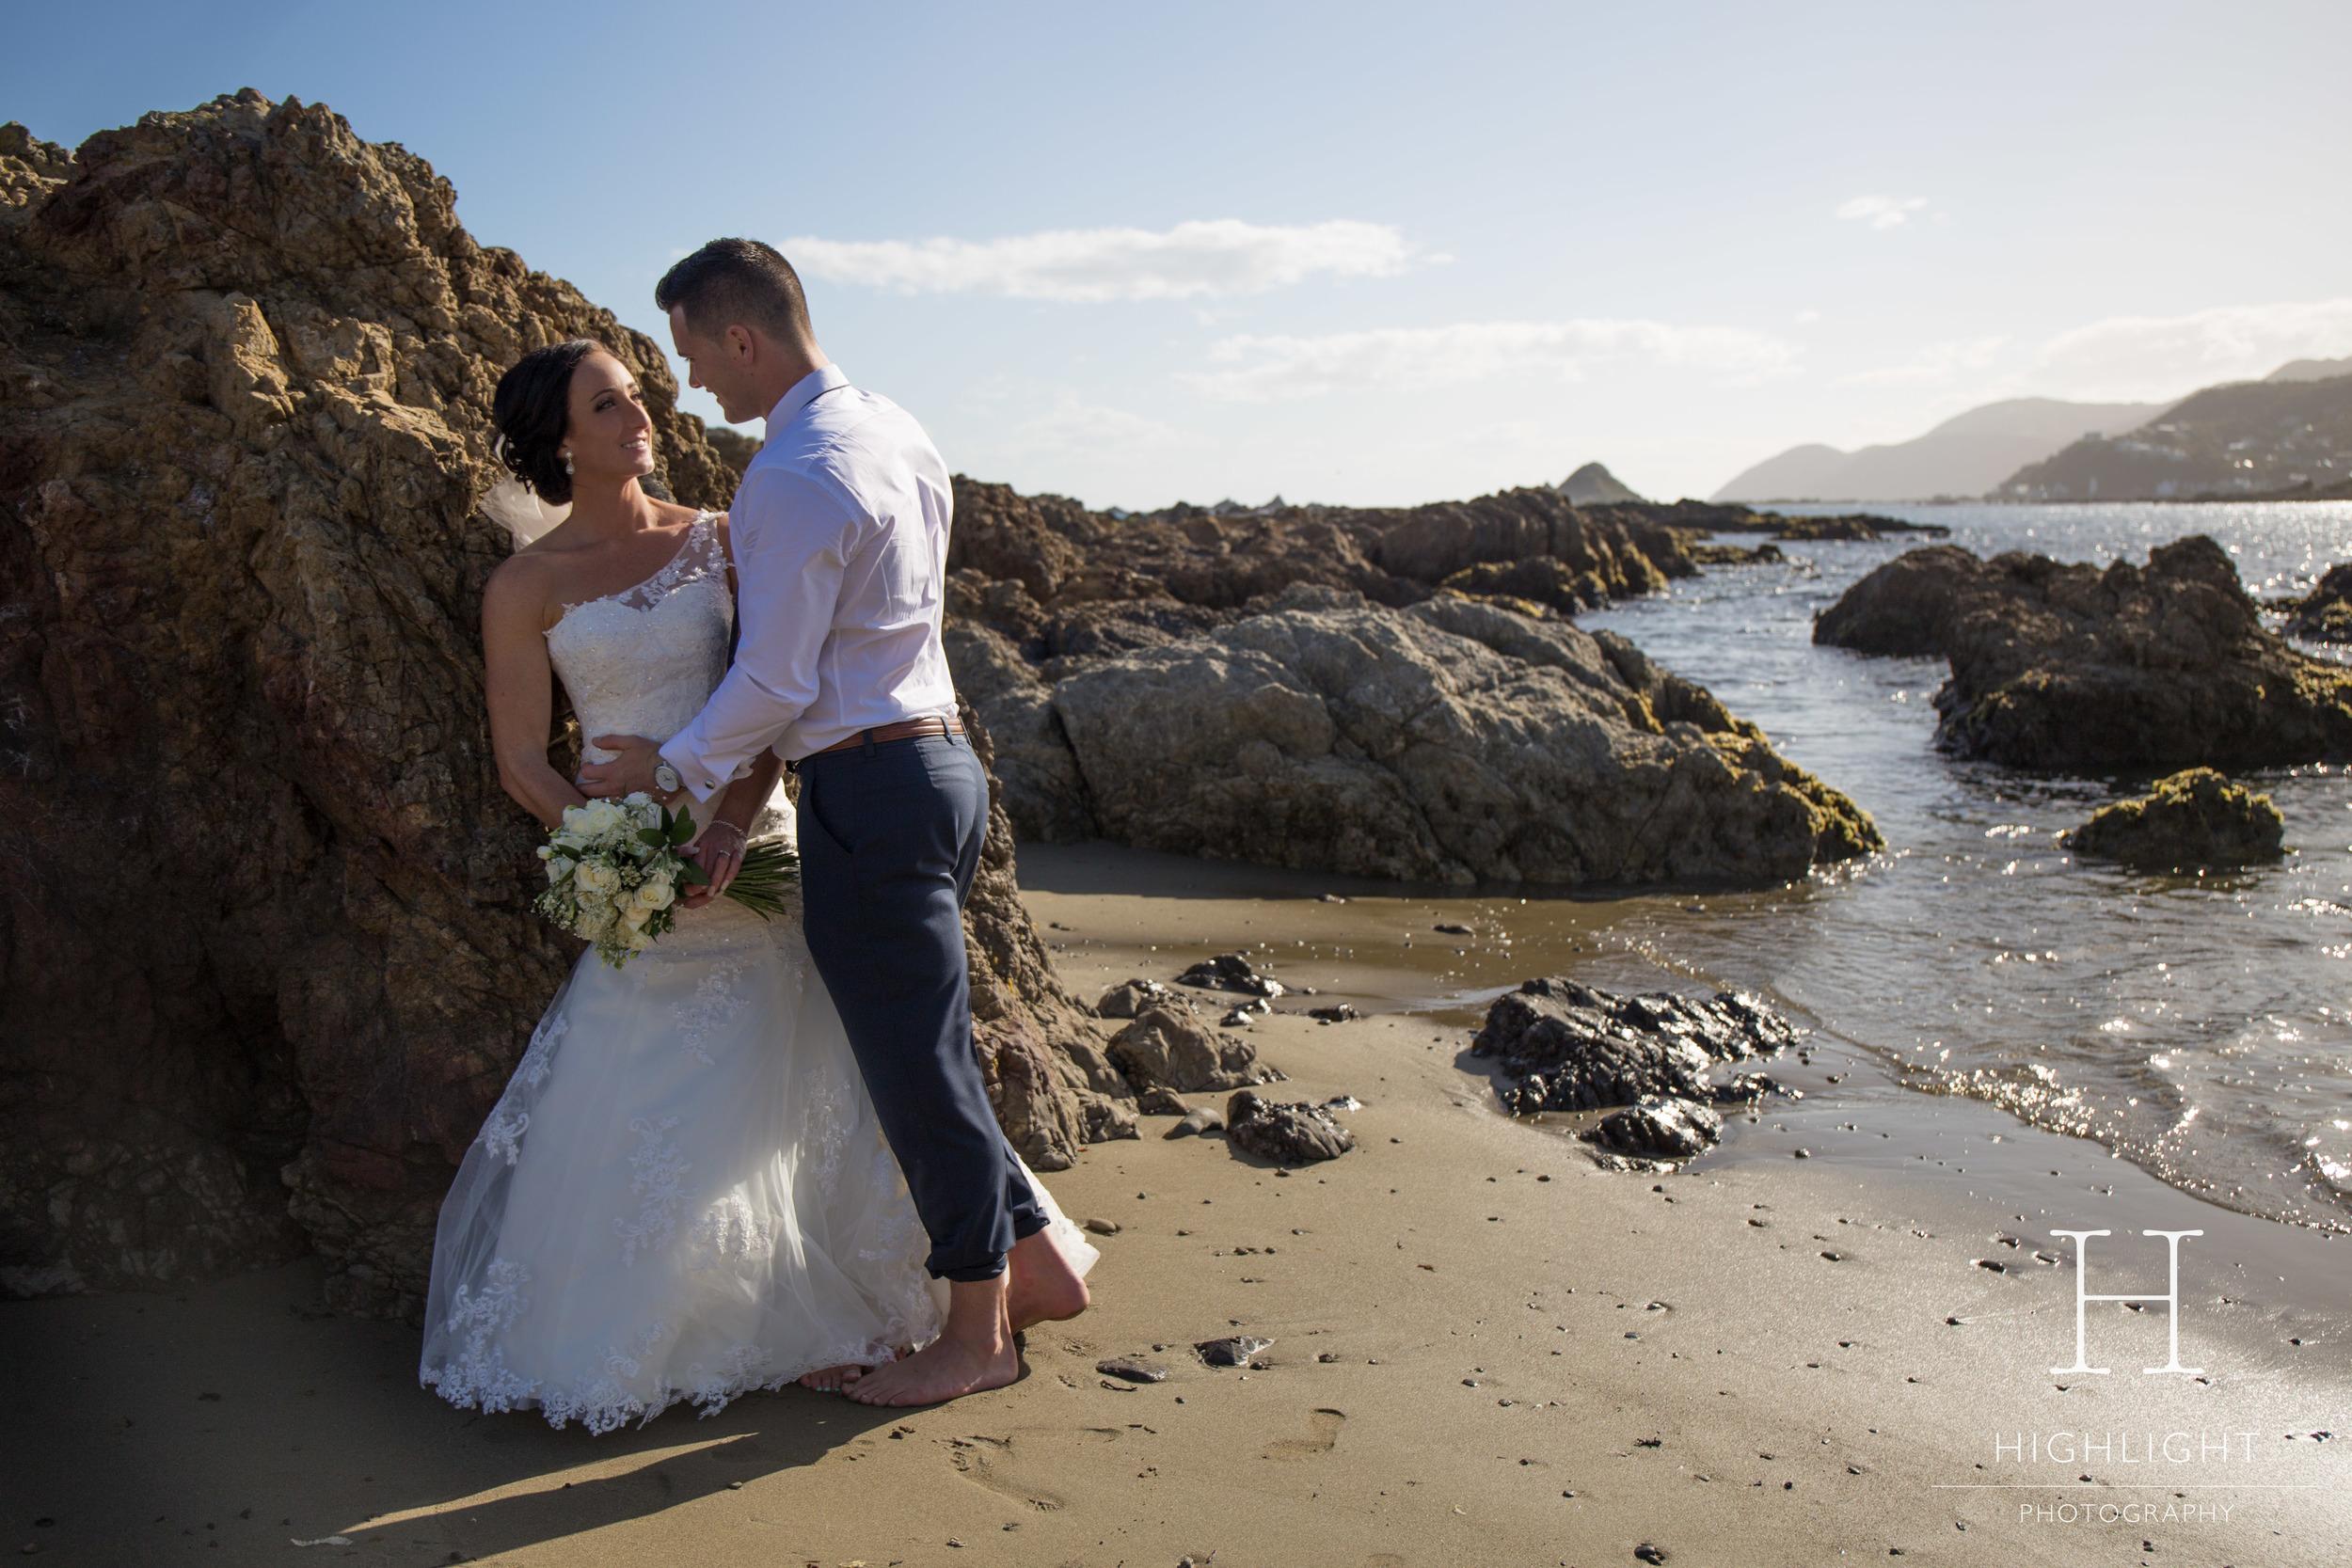 highlight_photography_wedding_new_zealand_rocks.jpg